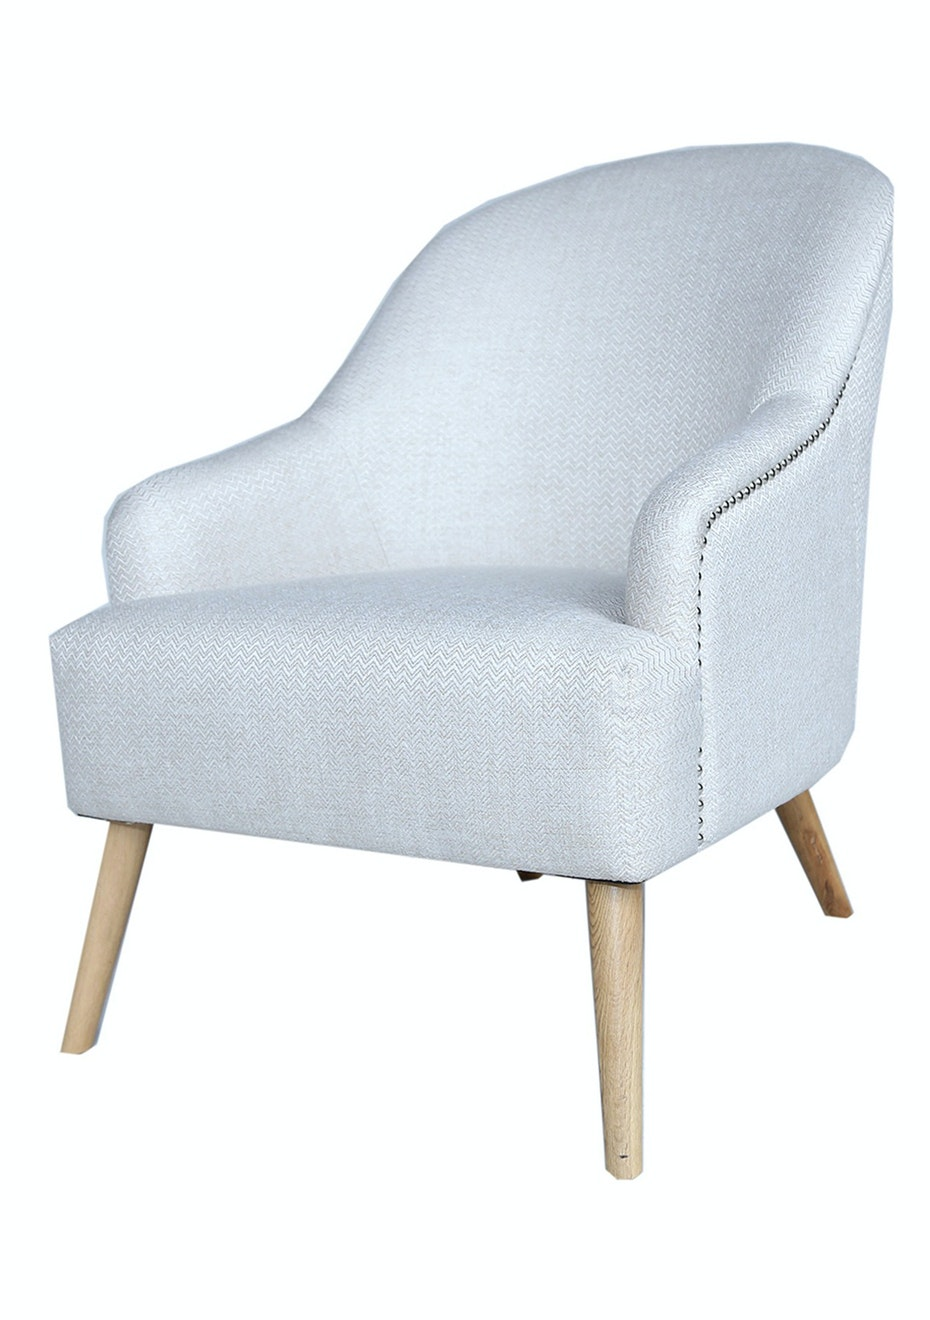 Bon Calypso Tub Chair   Off White   Premium Furniture U0026 Homeware   Onceit